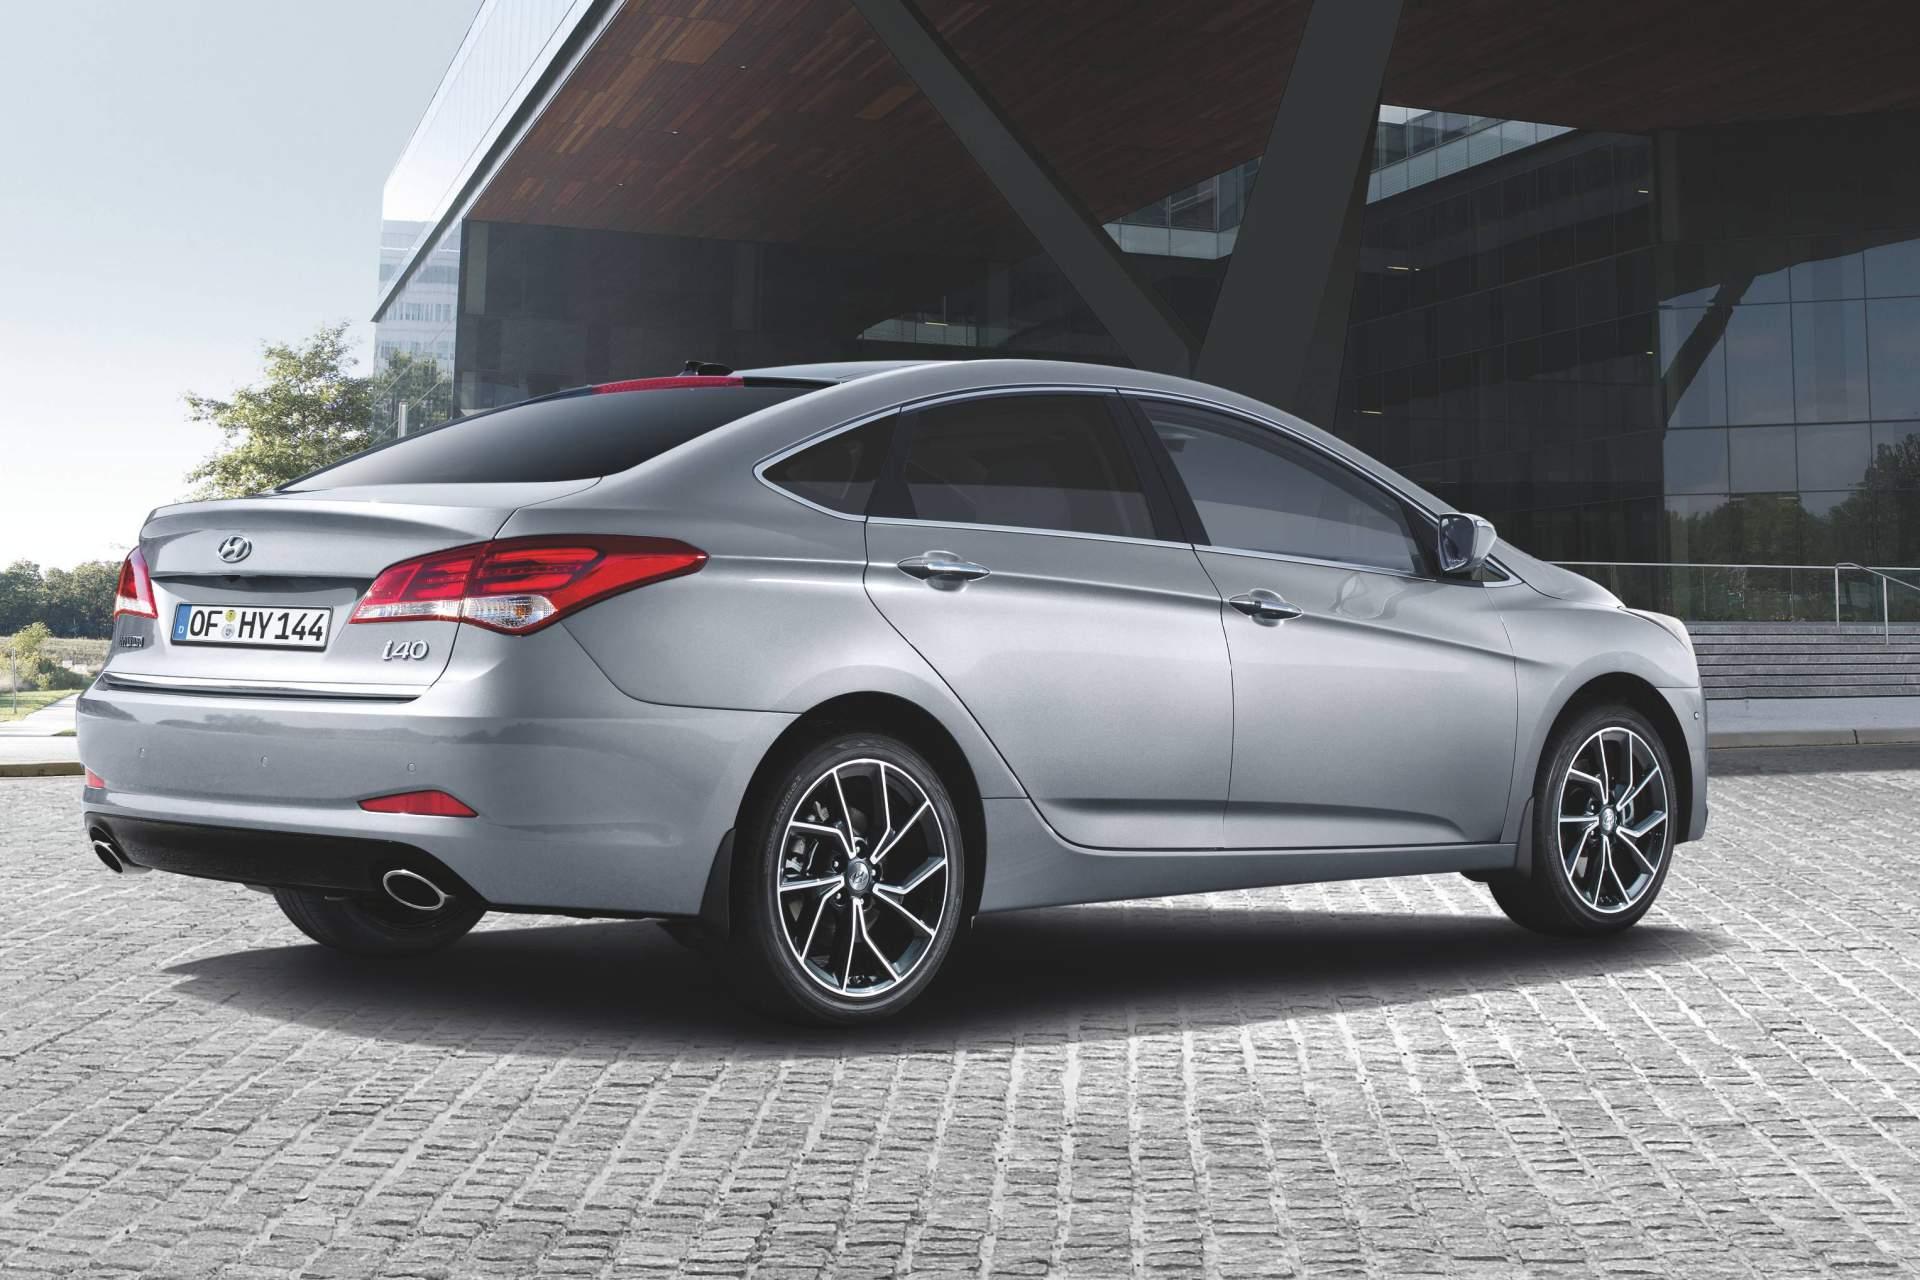 2019_Hyundai_i40_facelift–10